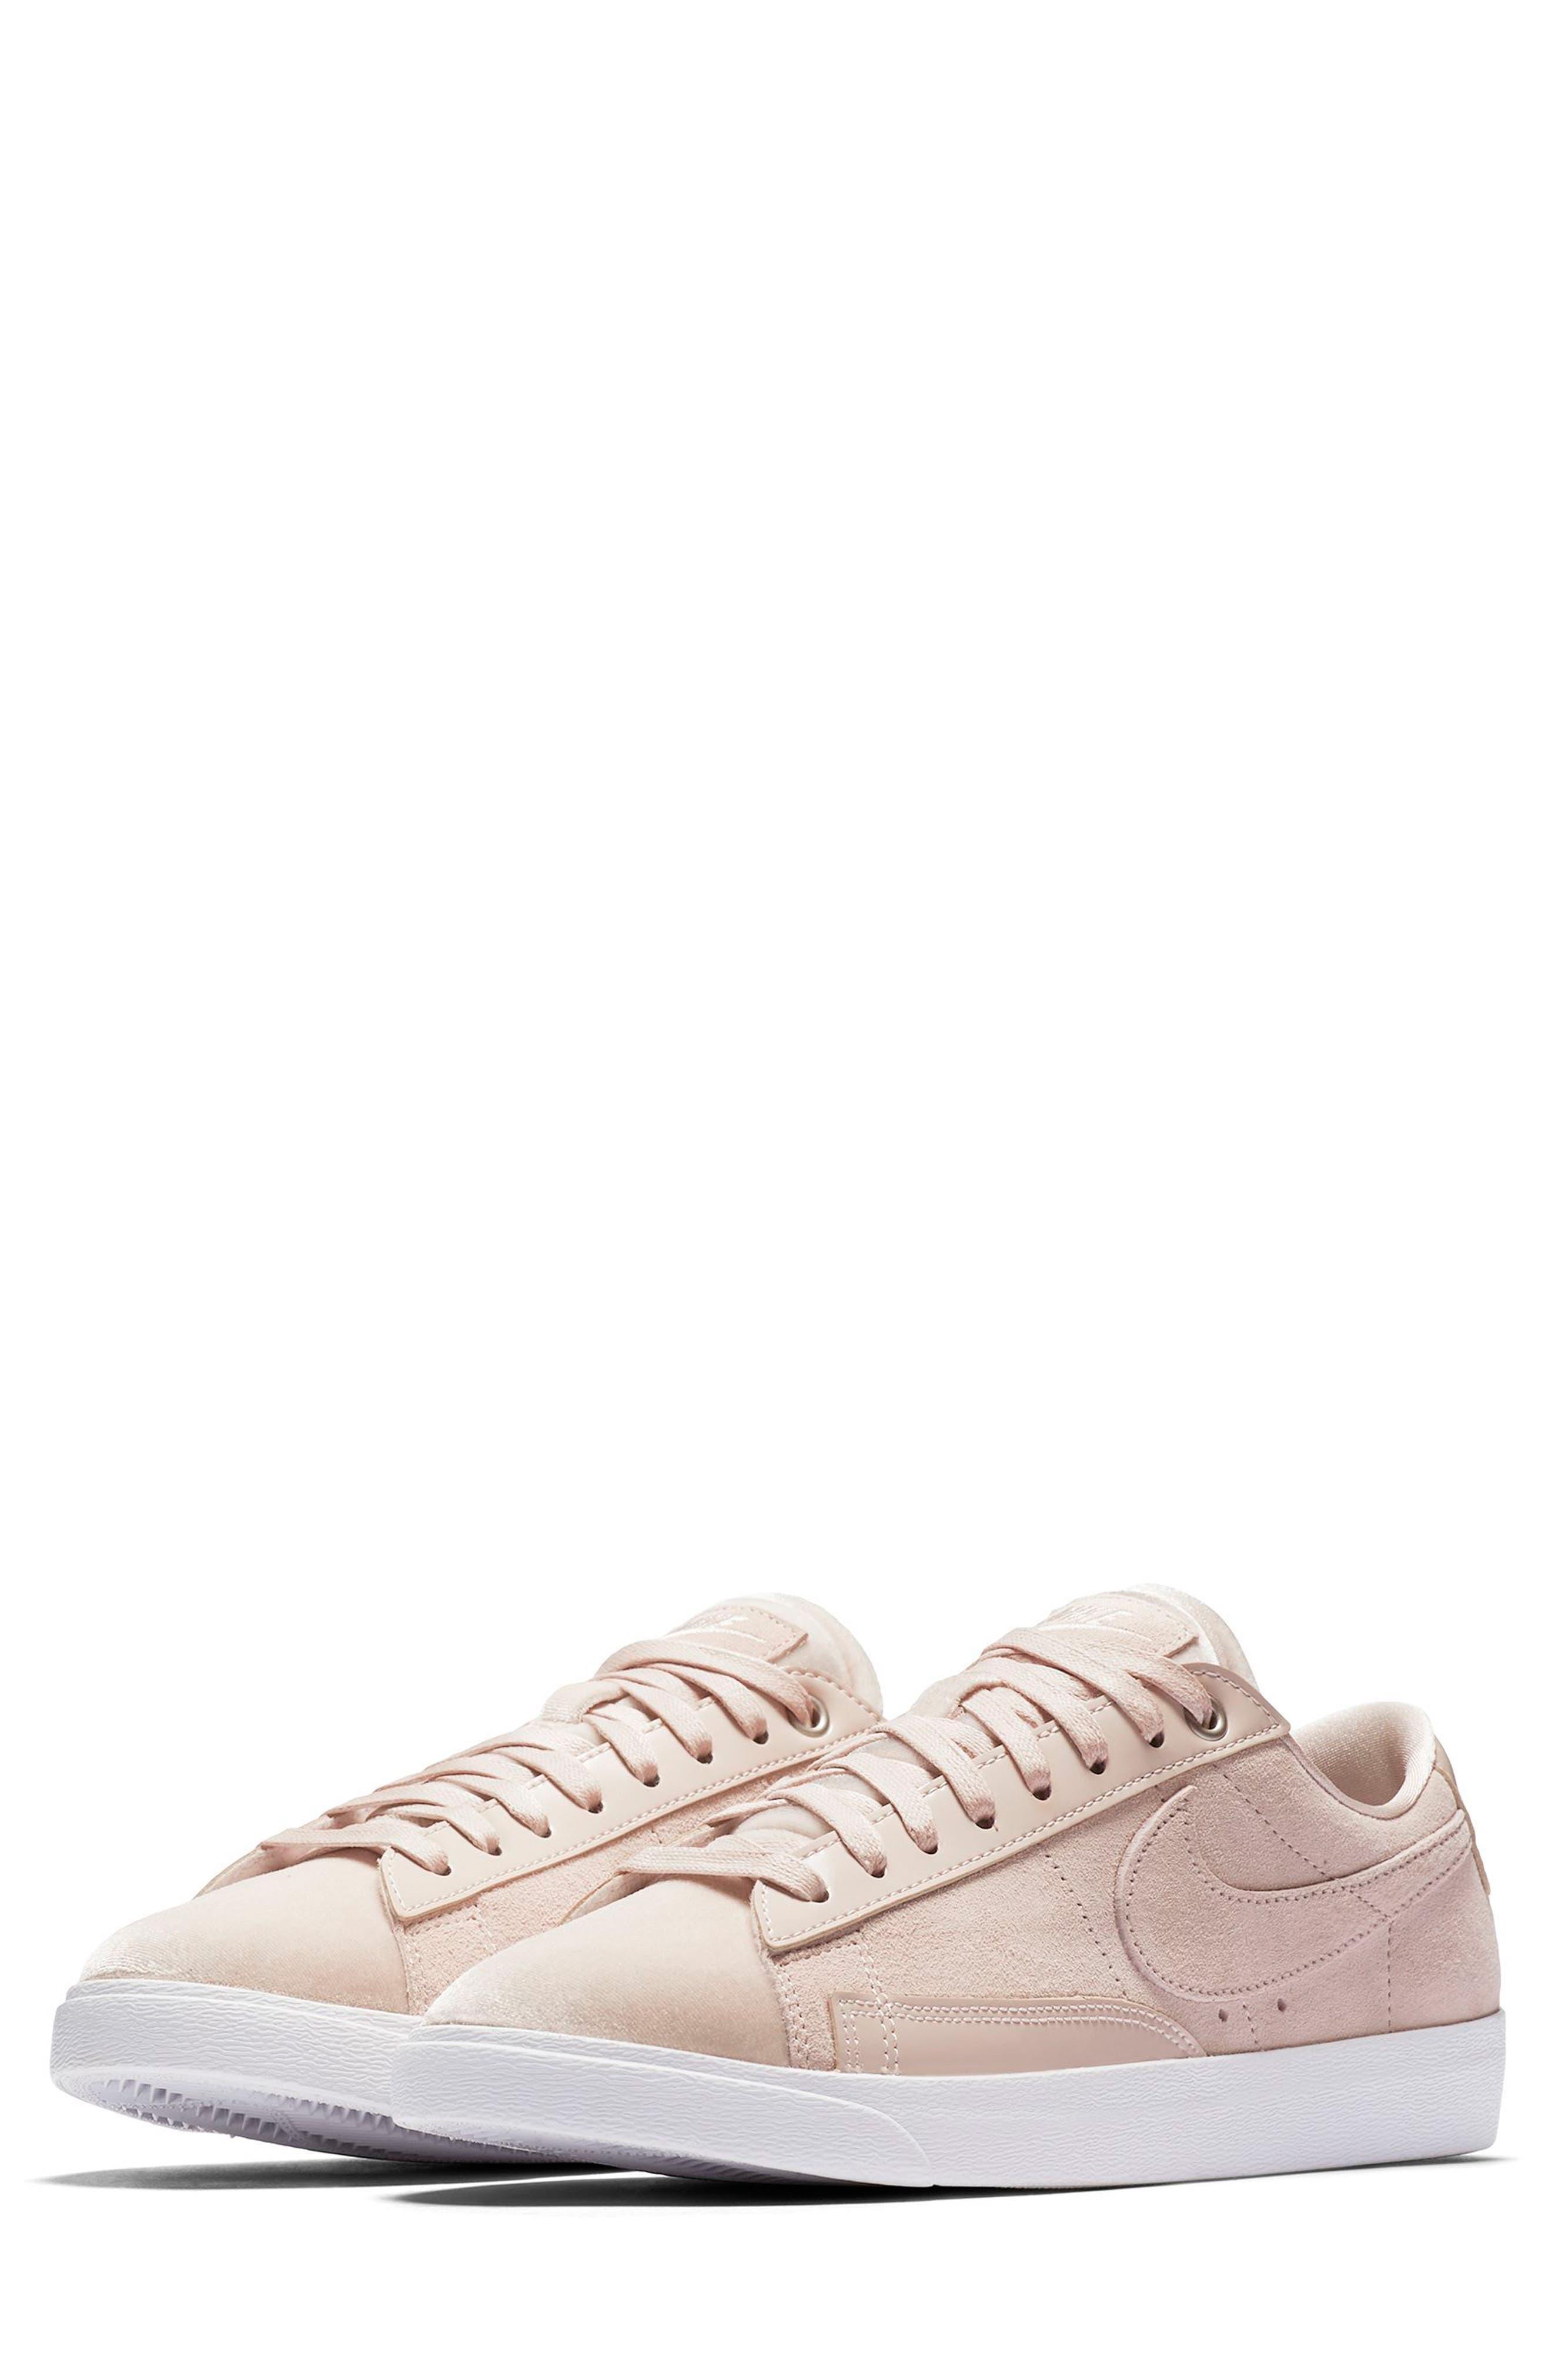 Alternate Image 1 Selected - Nike Blazer Low LX Sneaker (Women)